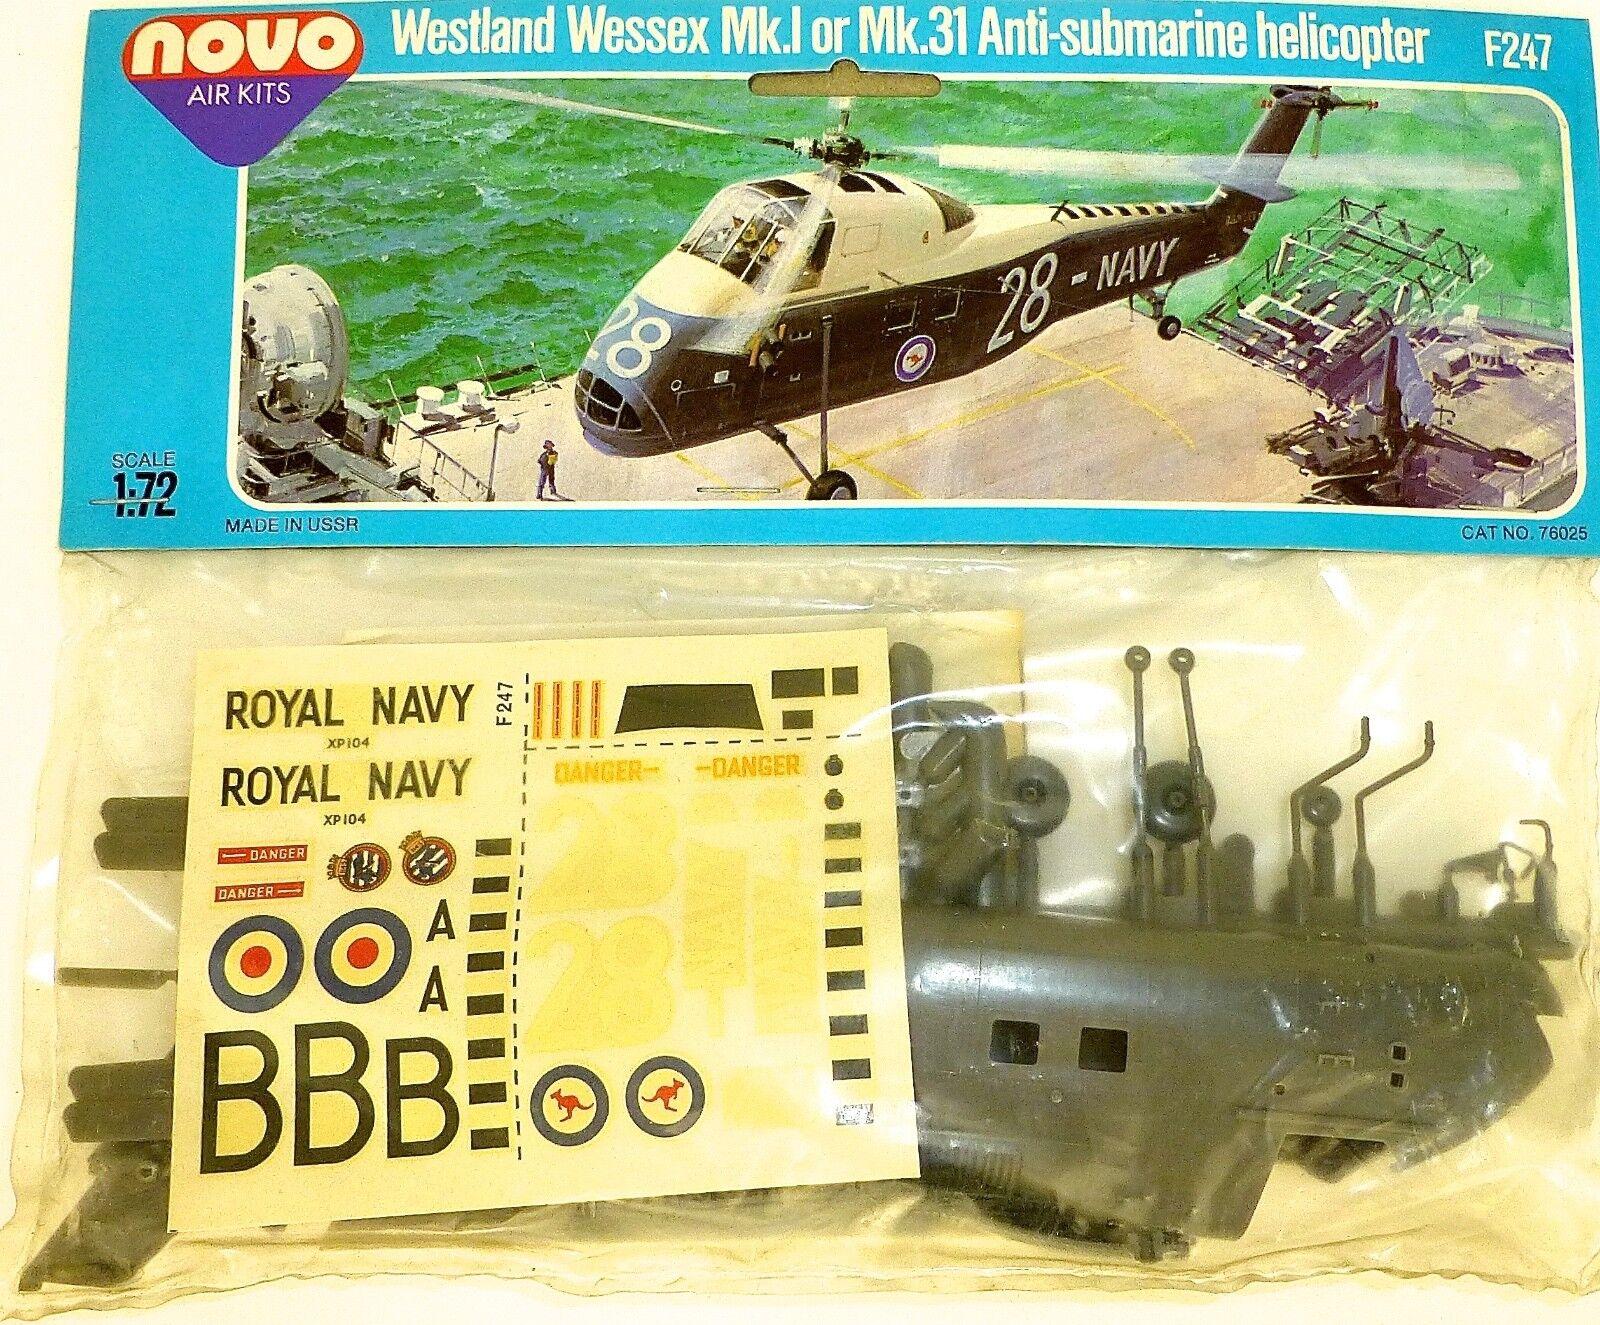 Westland Wessex Mk.i 31 Anti Sous-Marin Hélioptère F247 Novo 78025 1 72